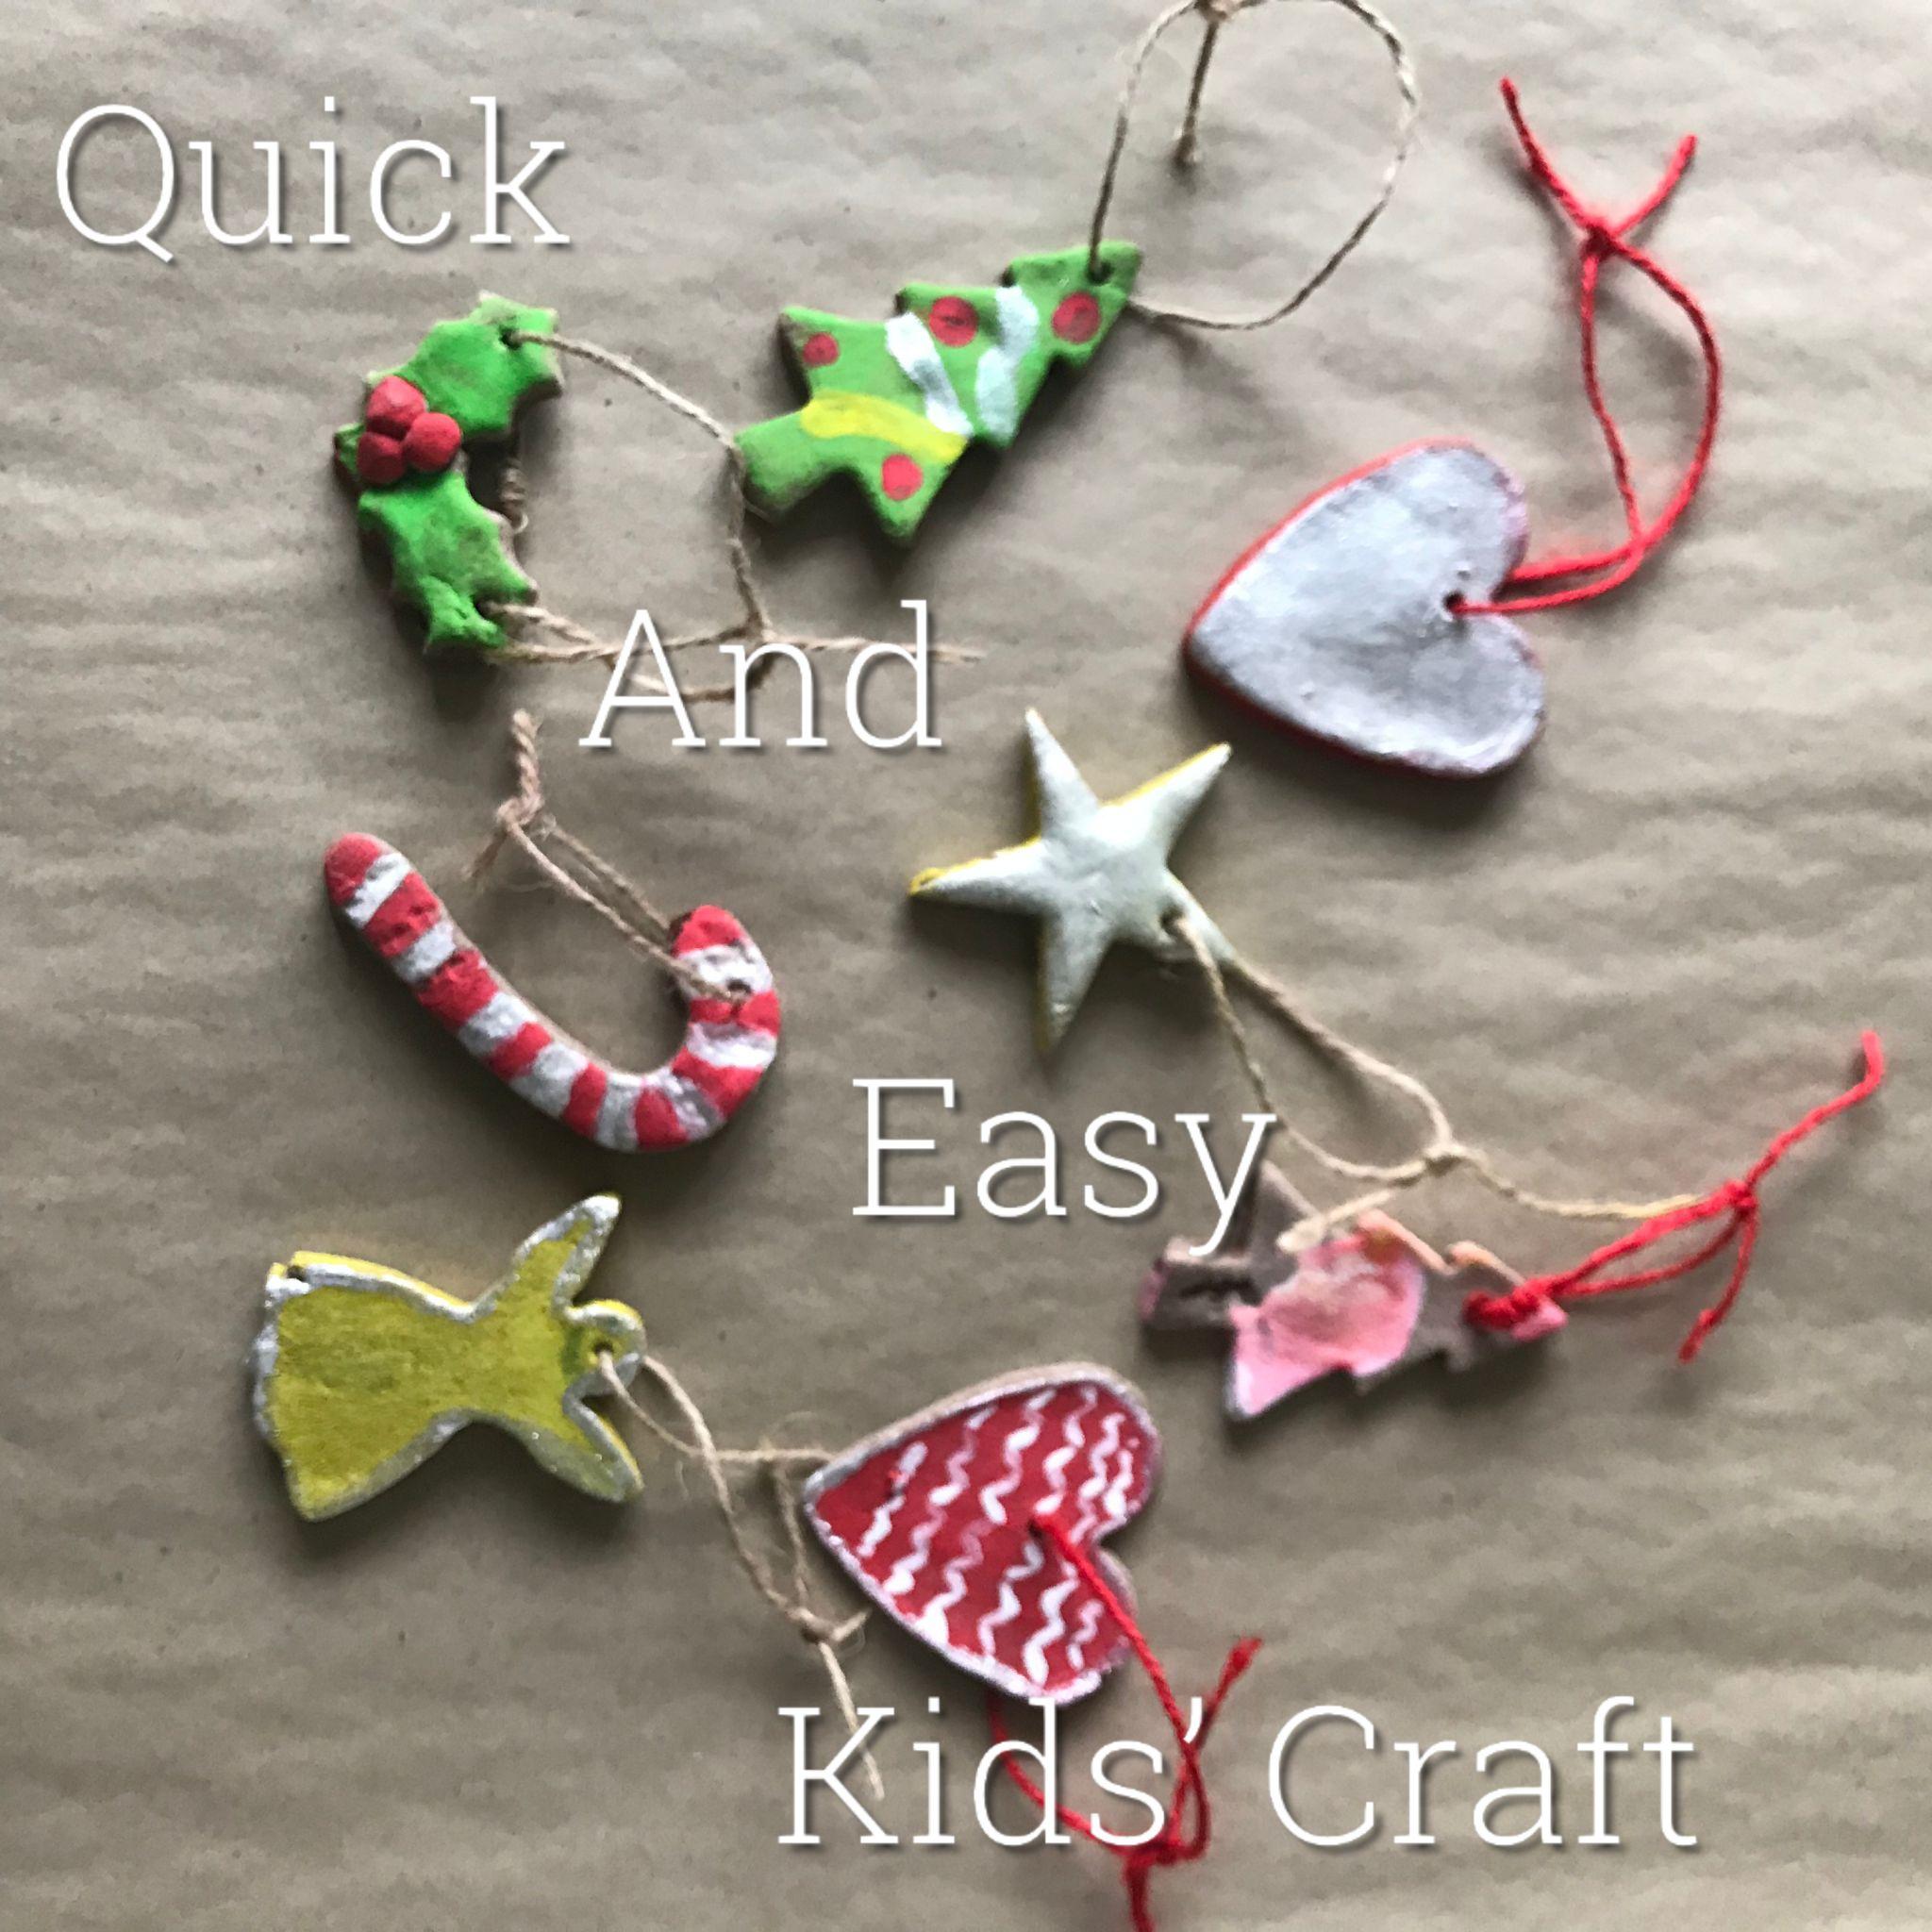 revsed Kids craft Title